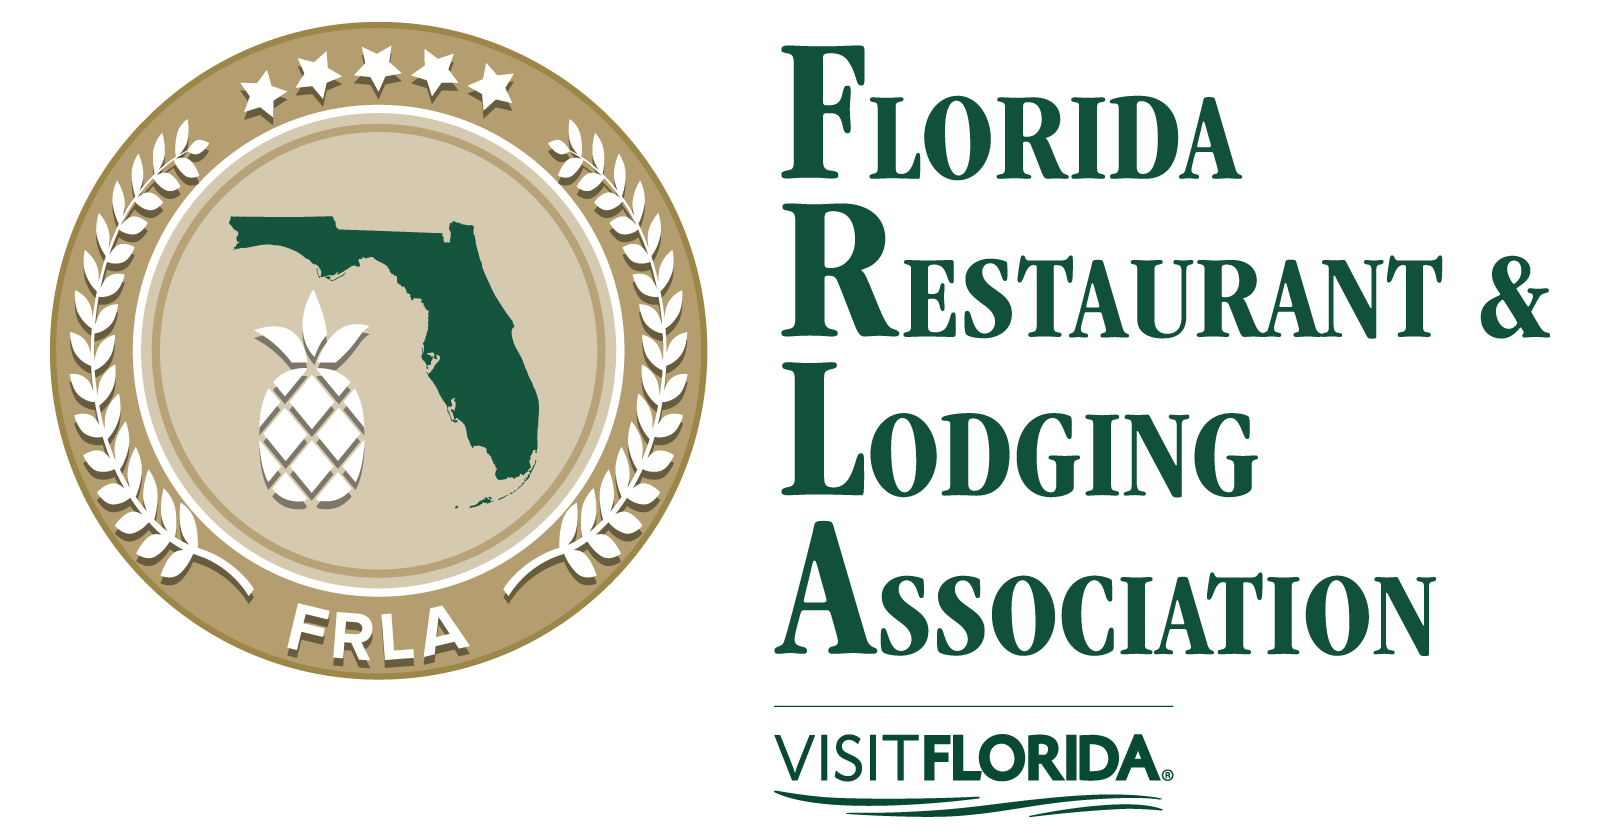 Florida Restaurant & Lodging Association and VISIT FLORIDA